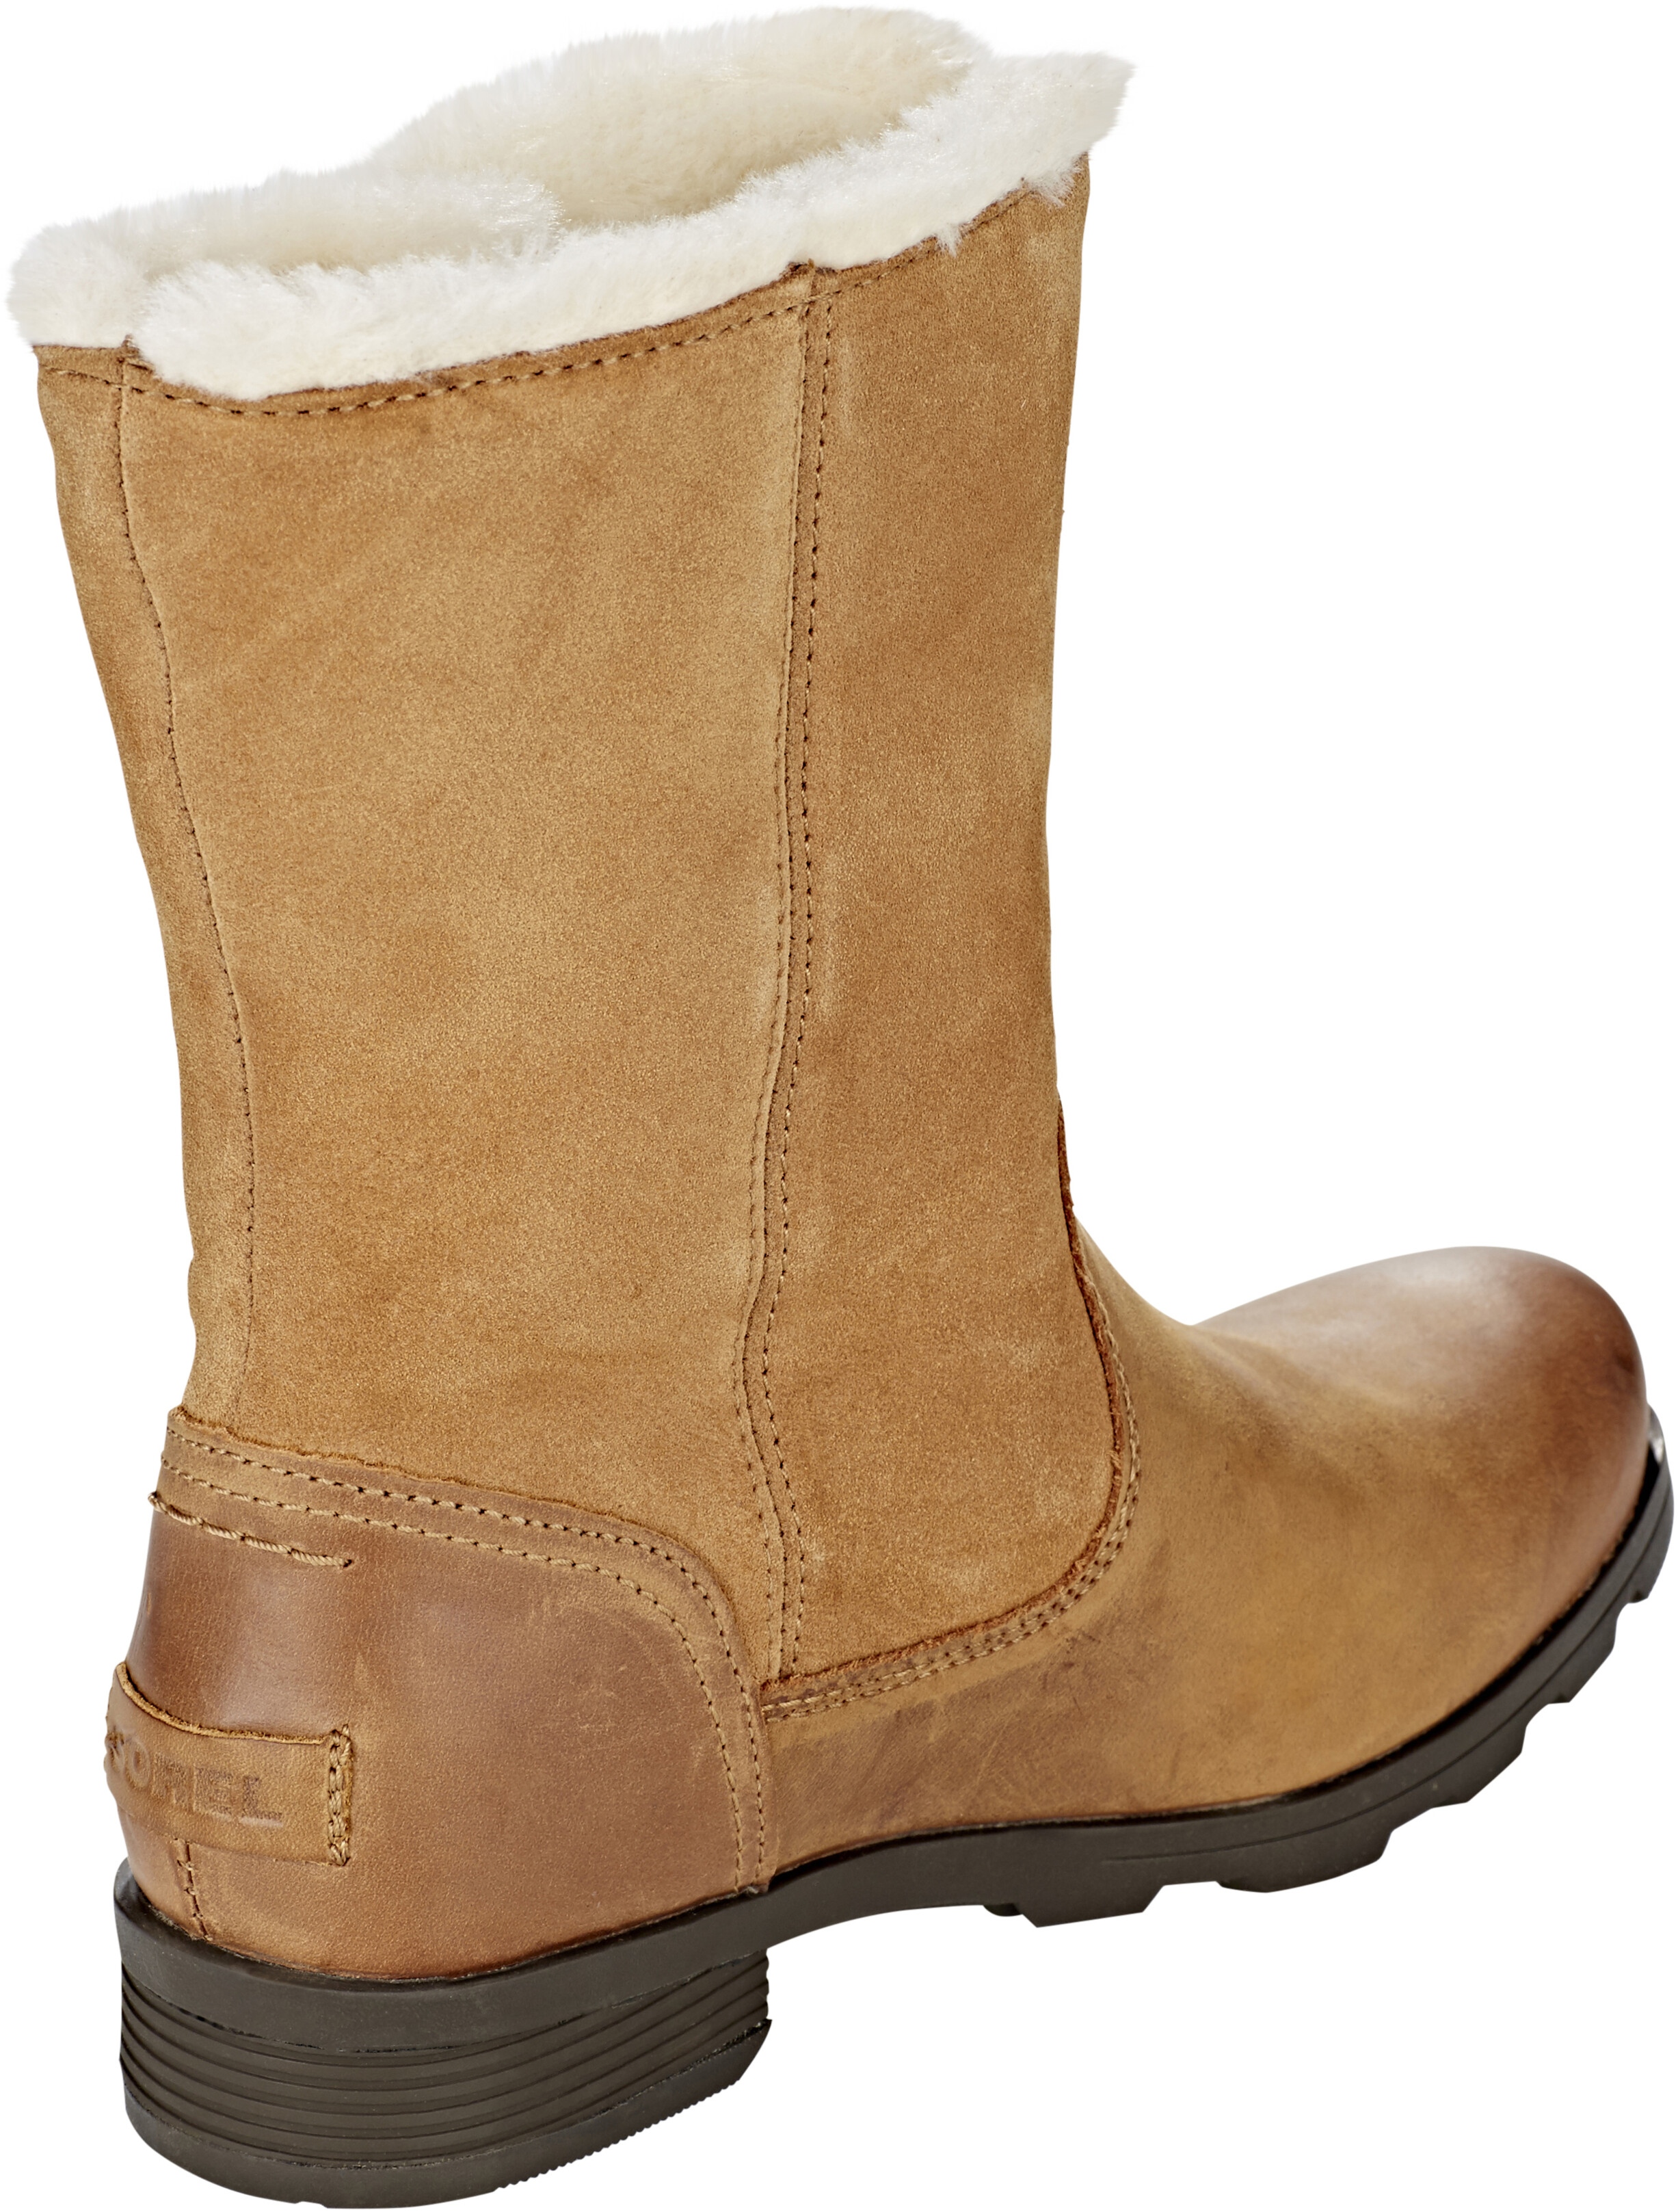 426b65351a0ef1 Sorel Emelie Foldover Boots Women Camel Brown